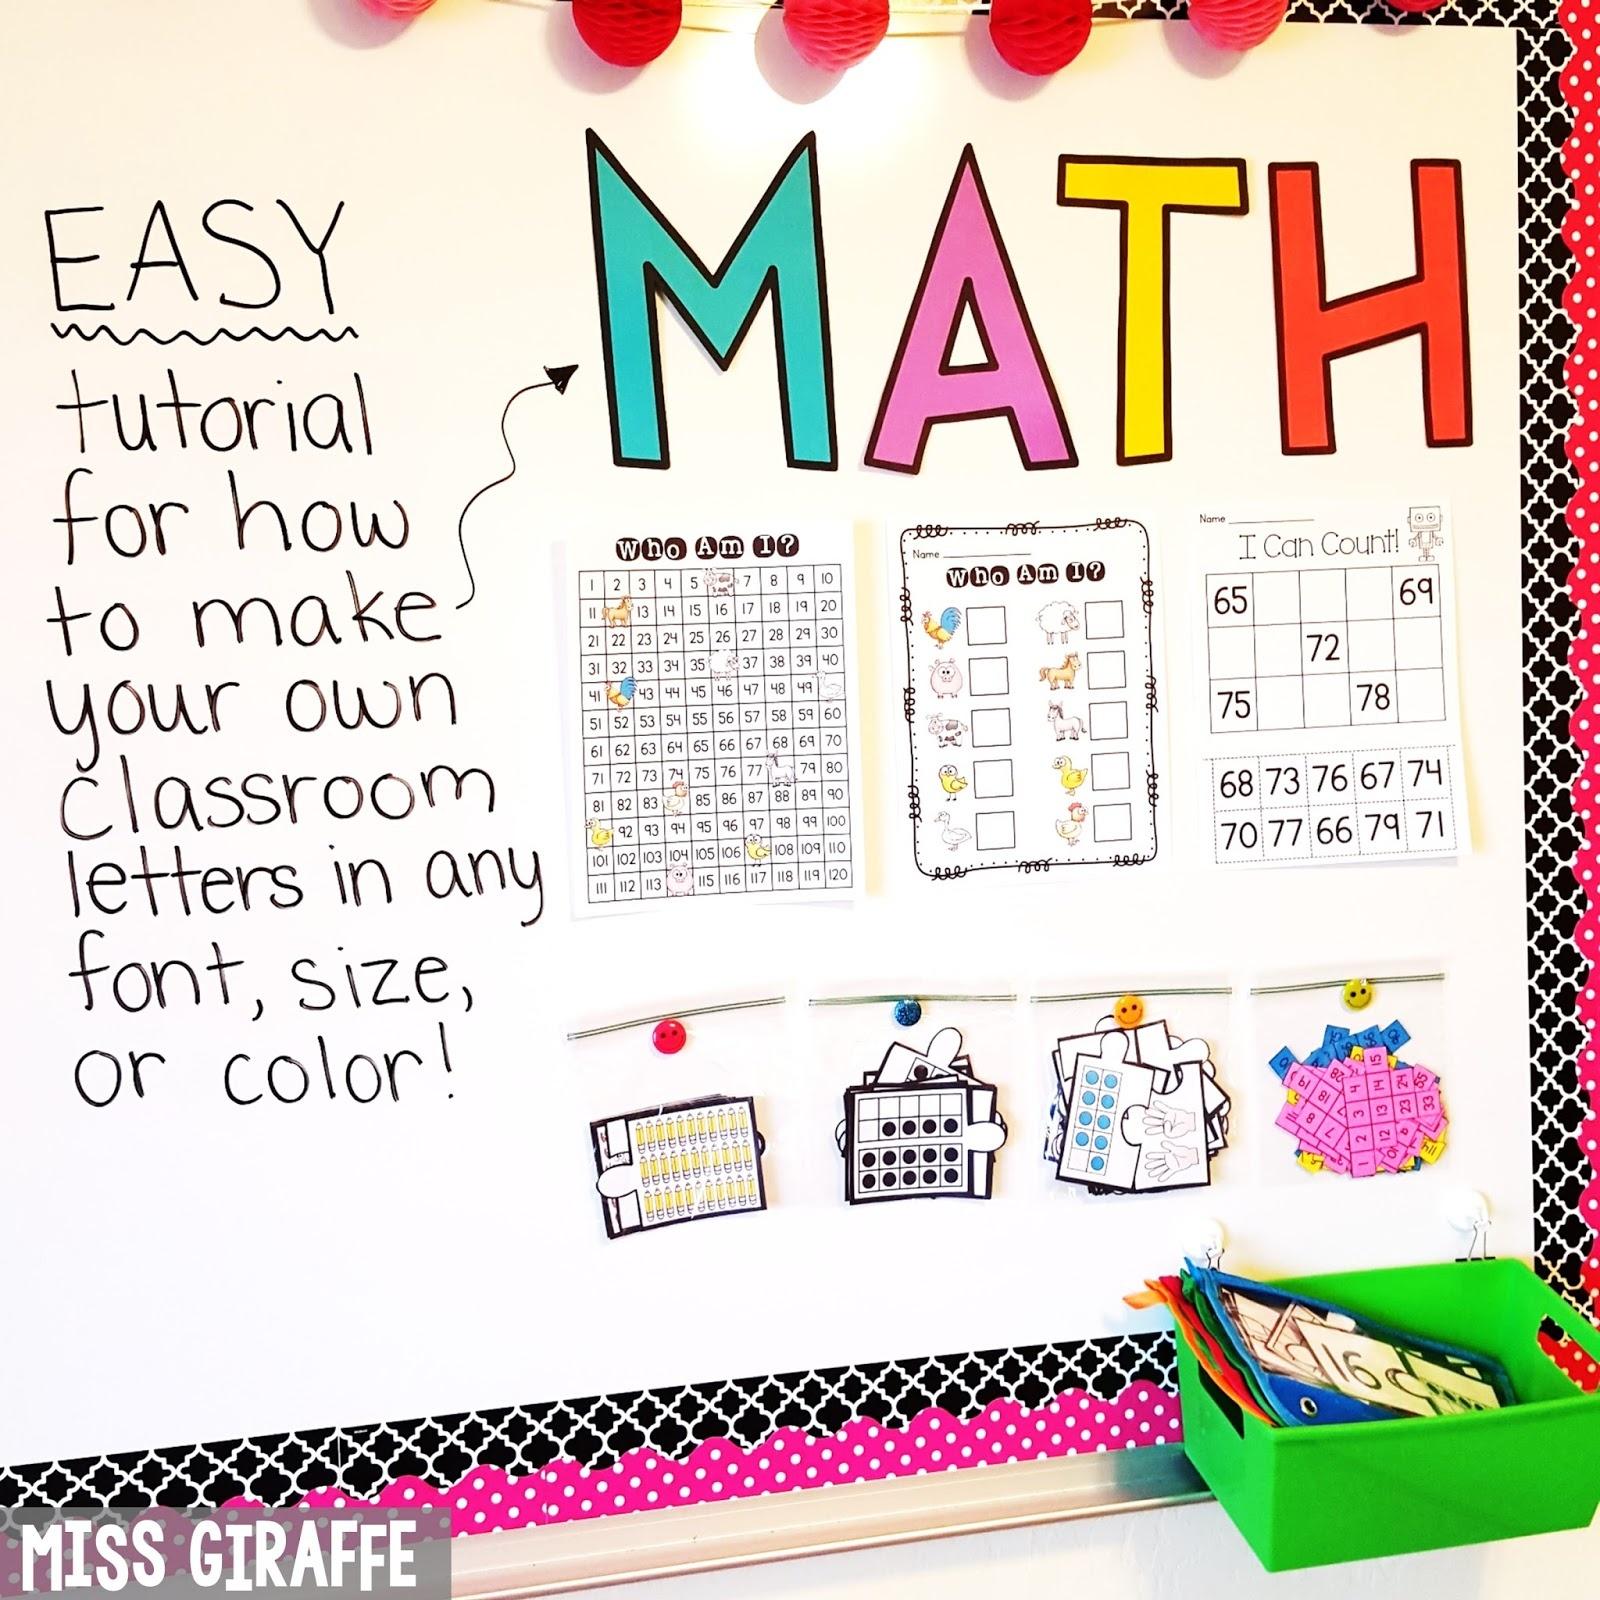 Miss Giraffe's Class: Diy Classroom Decor Bulletin Board Letters - Free Printable Letters For Bulletin Boards